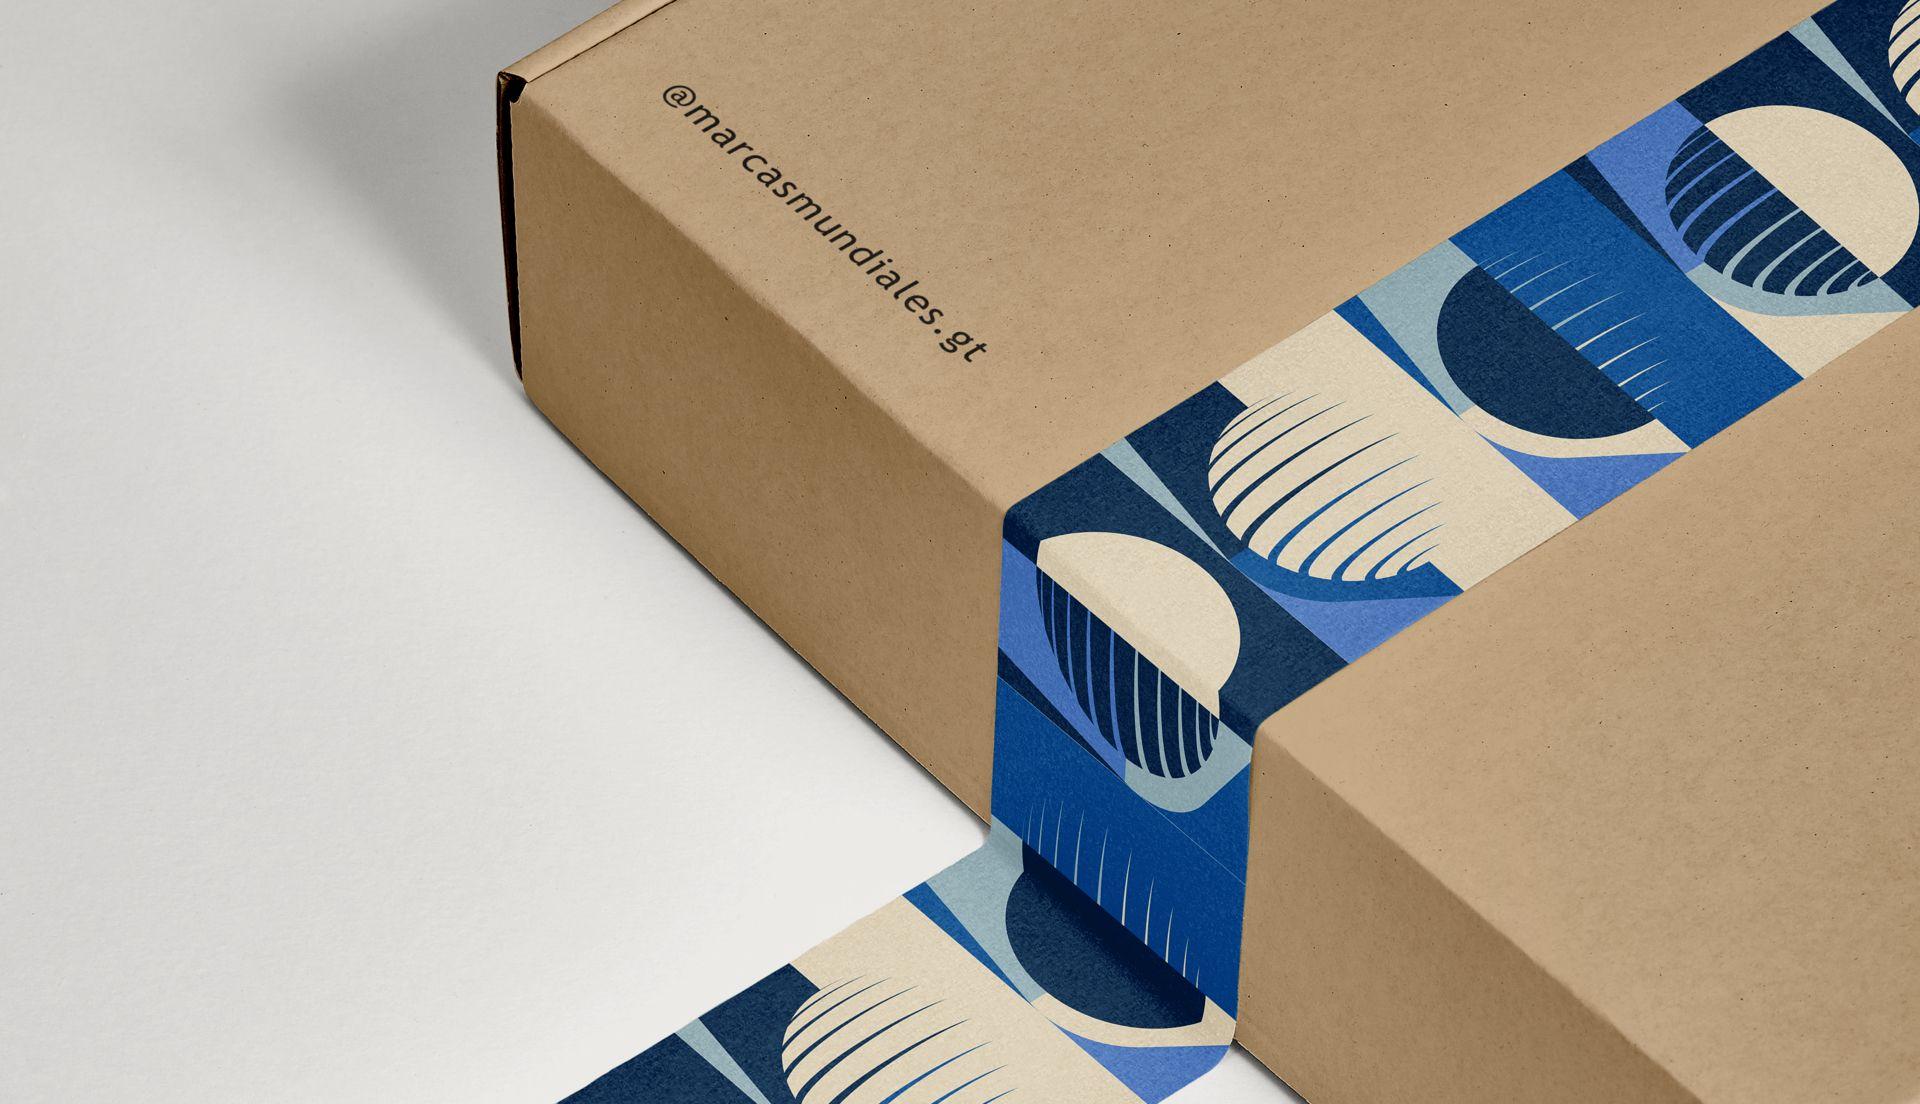 Pattern design for corporate brand identity